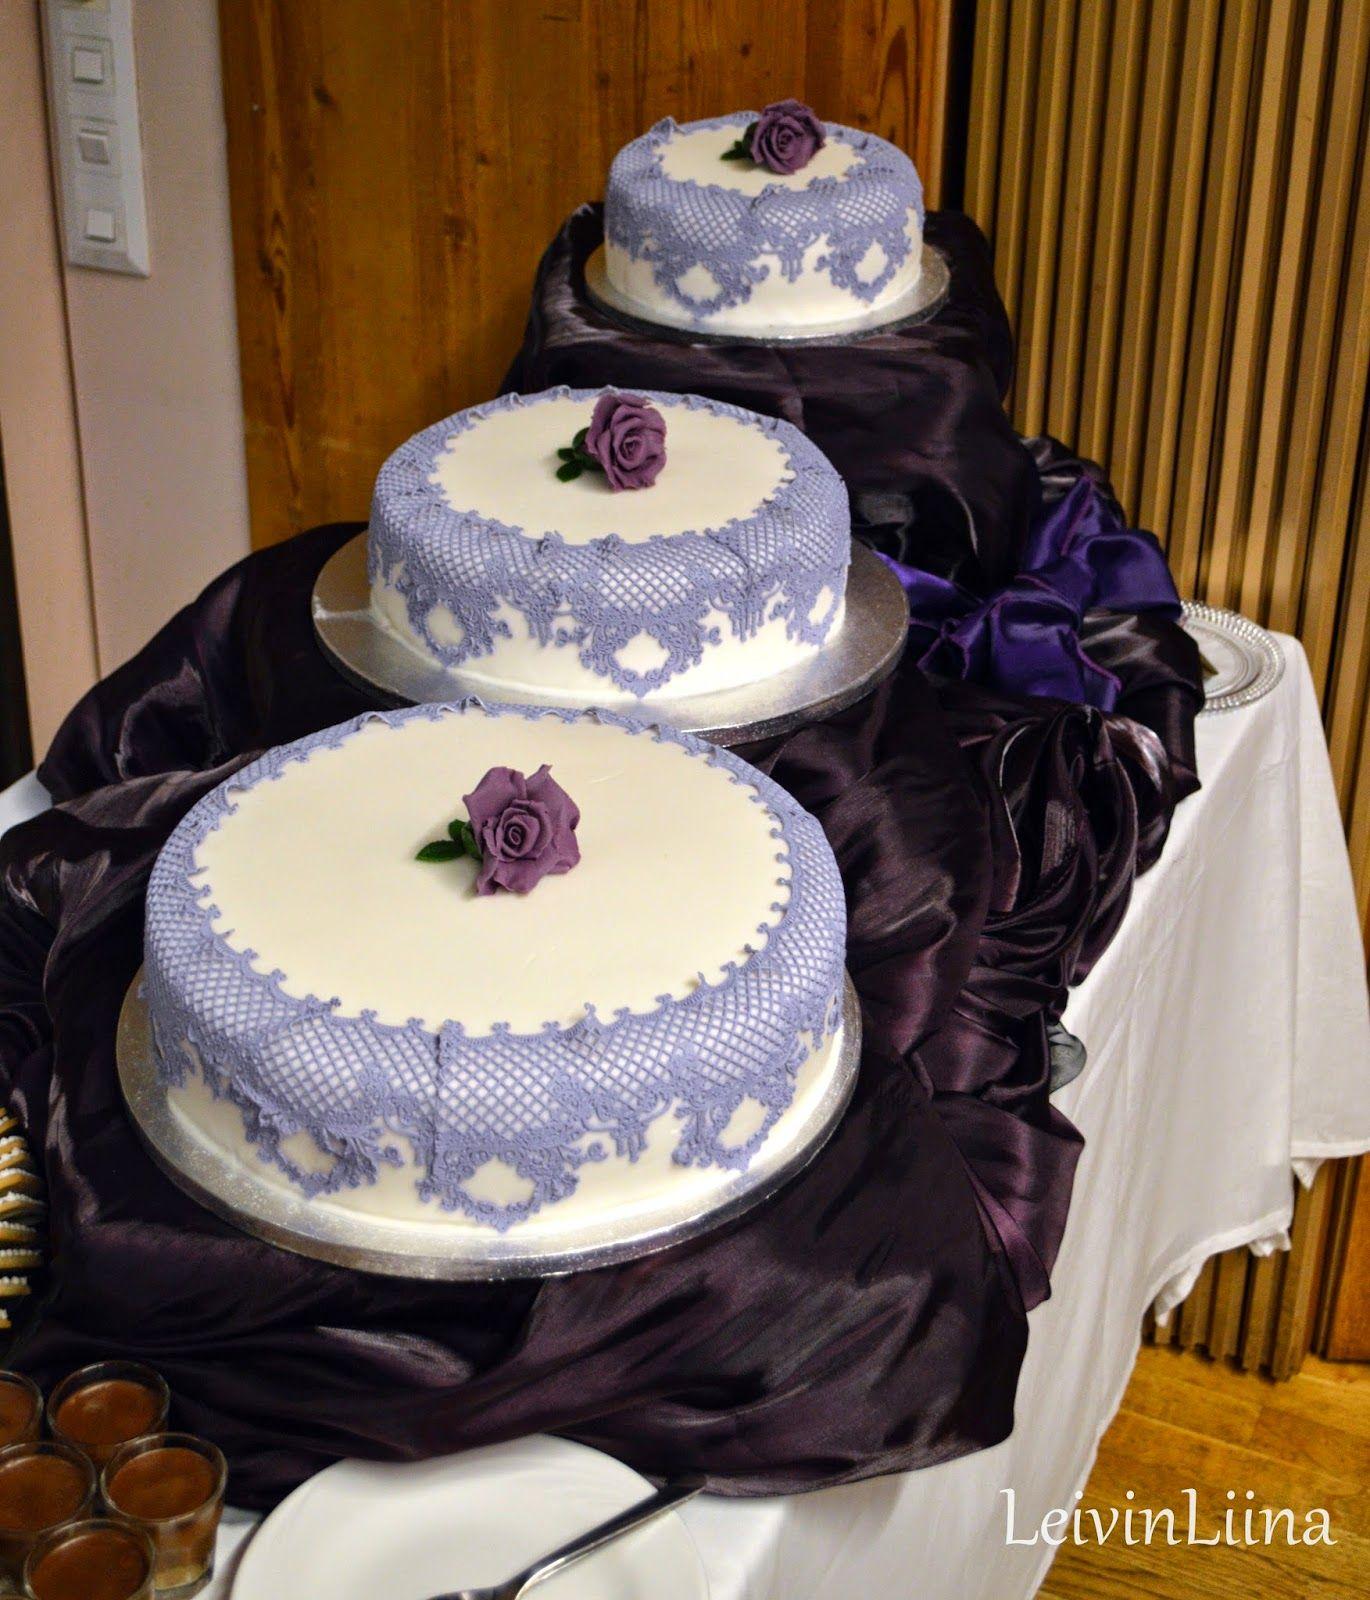 Purple Lace Cake by LeivinLiina